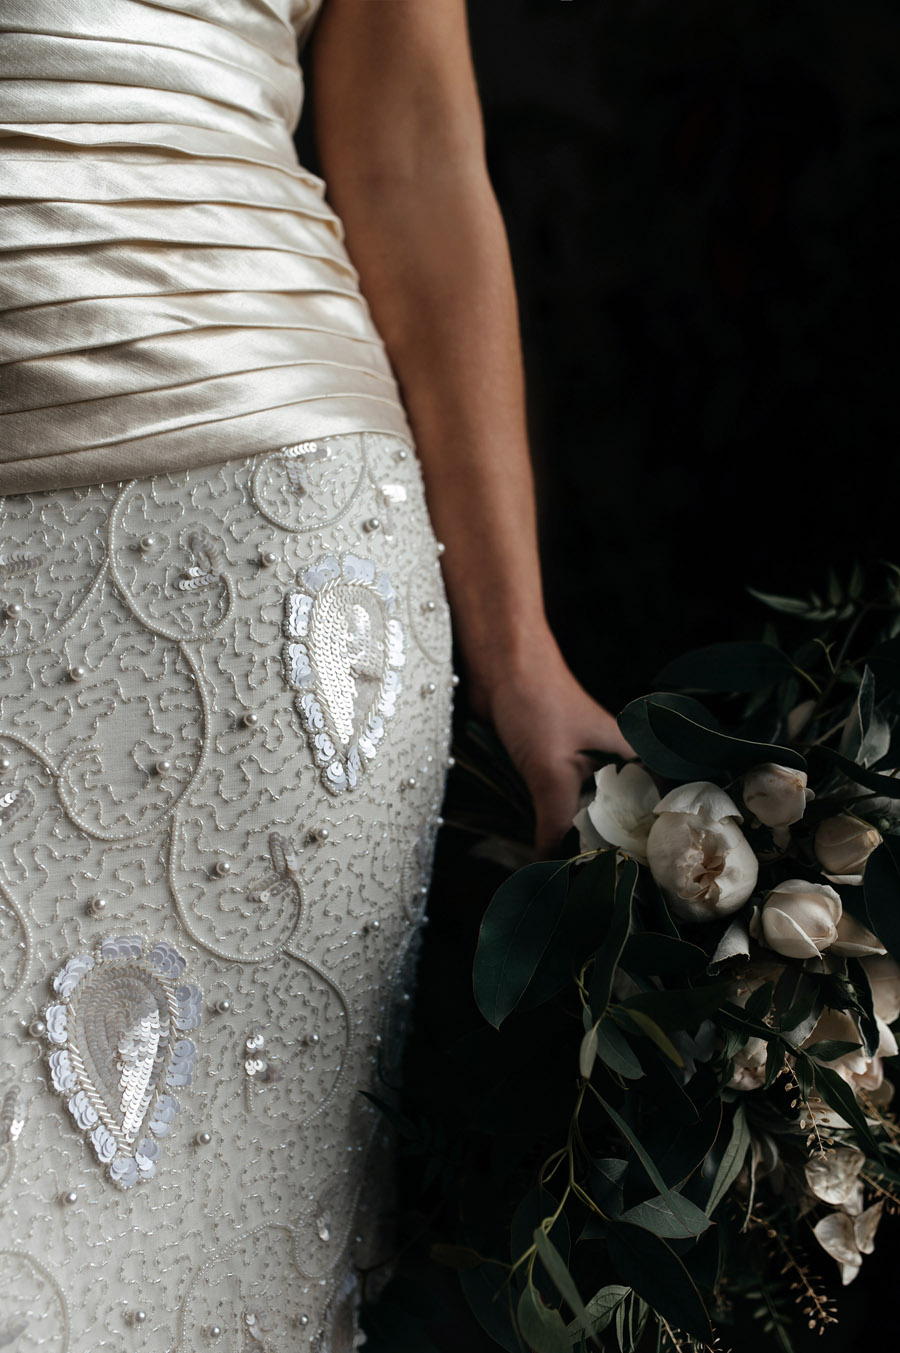 Eco vegan wedding style inspiration with Sanyukta Shrestha, credit KMGS Photography (3)